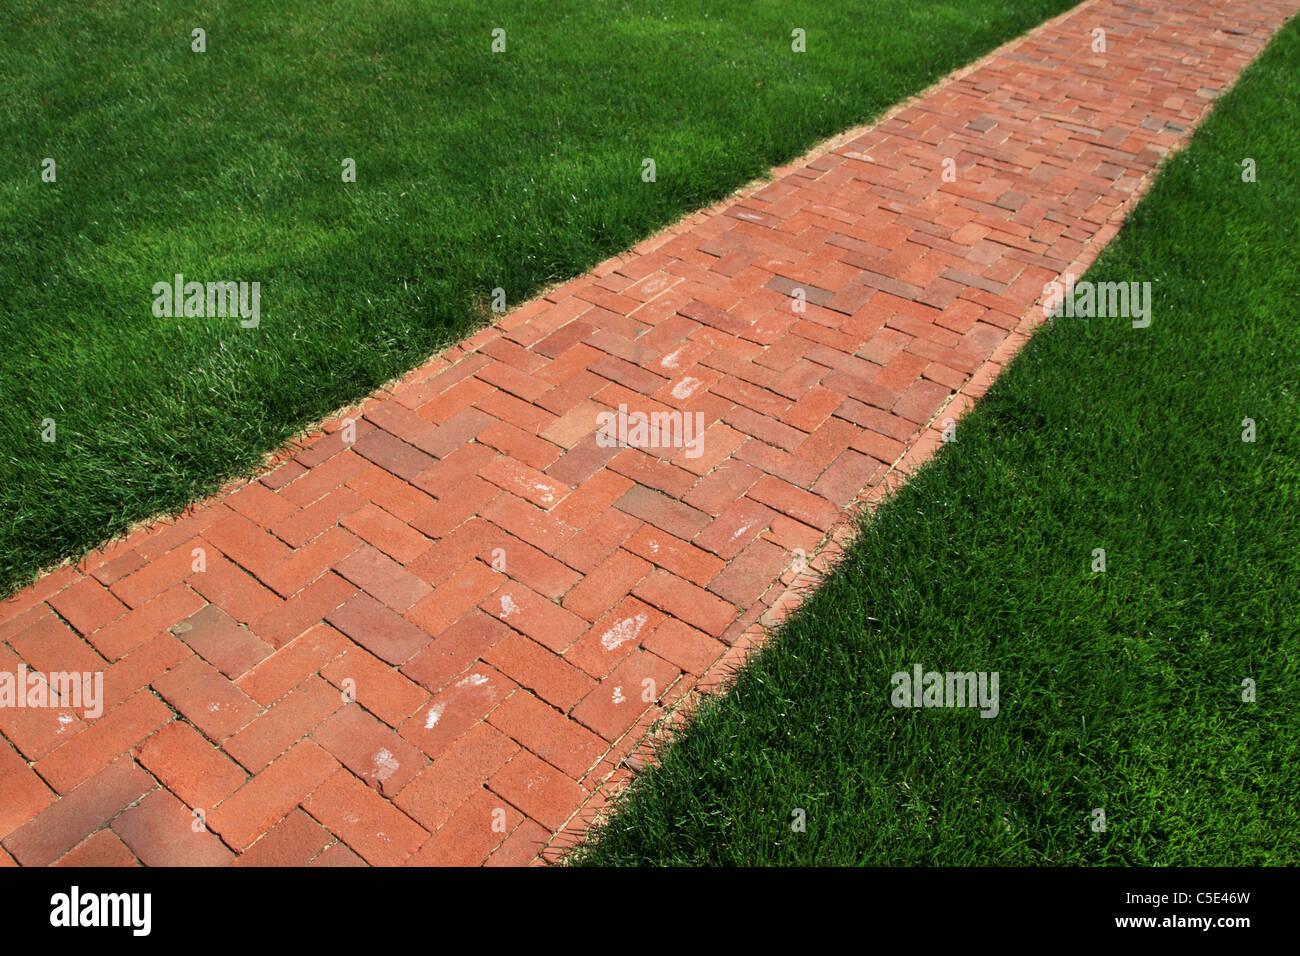 Herringbone Brick Pattern Stock Photos Amp Herringbone Brick